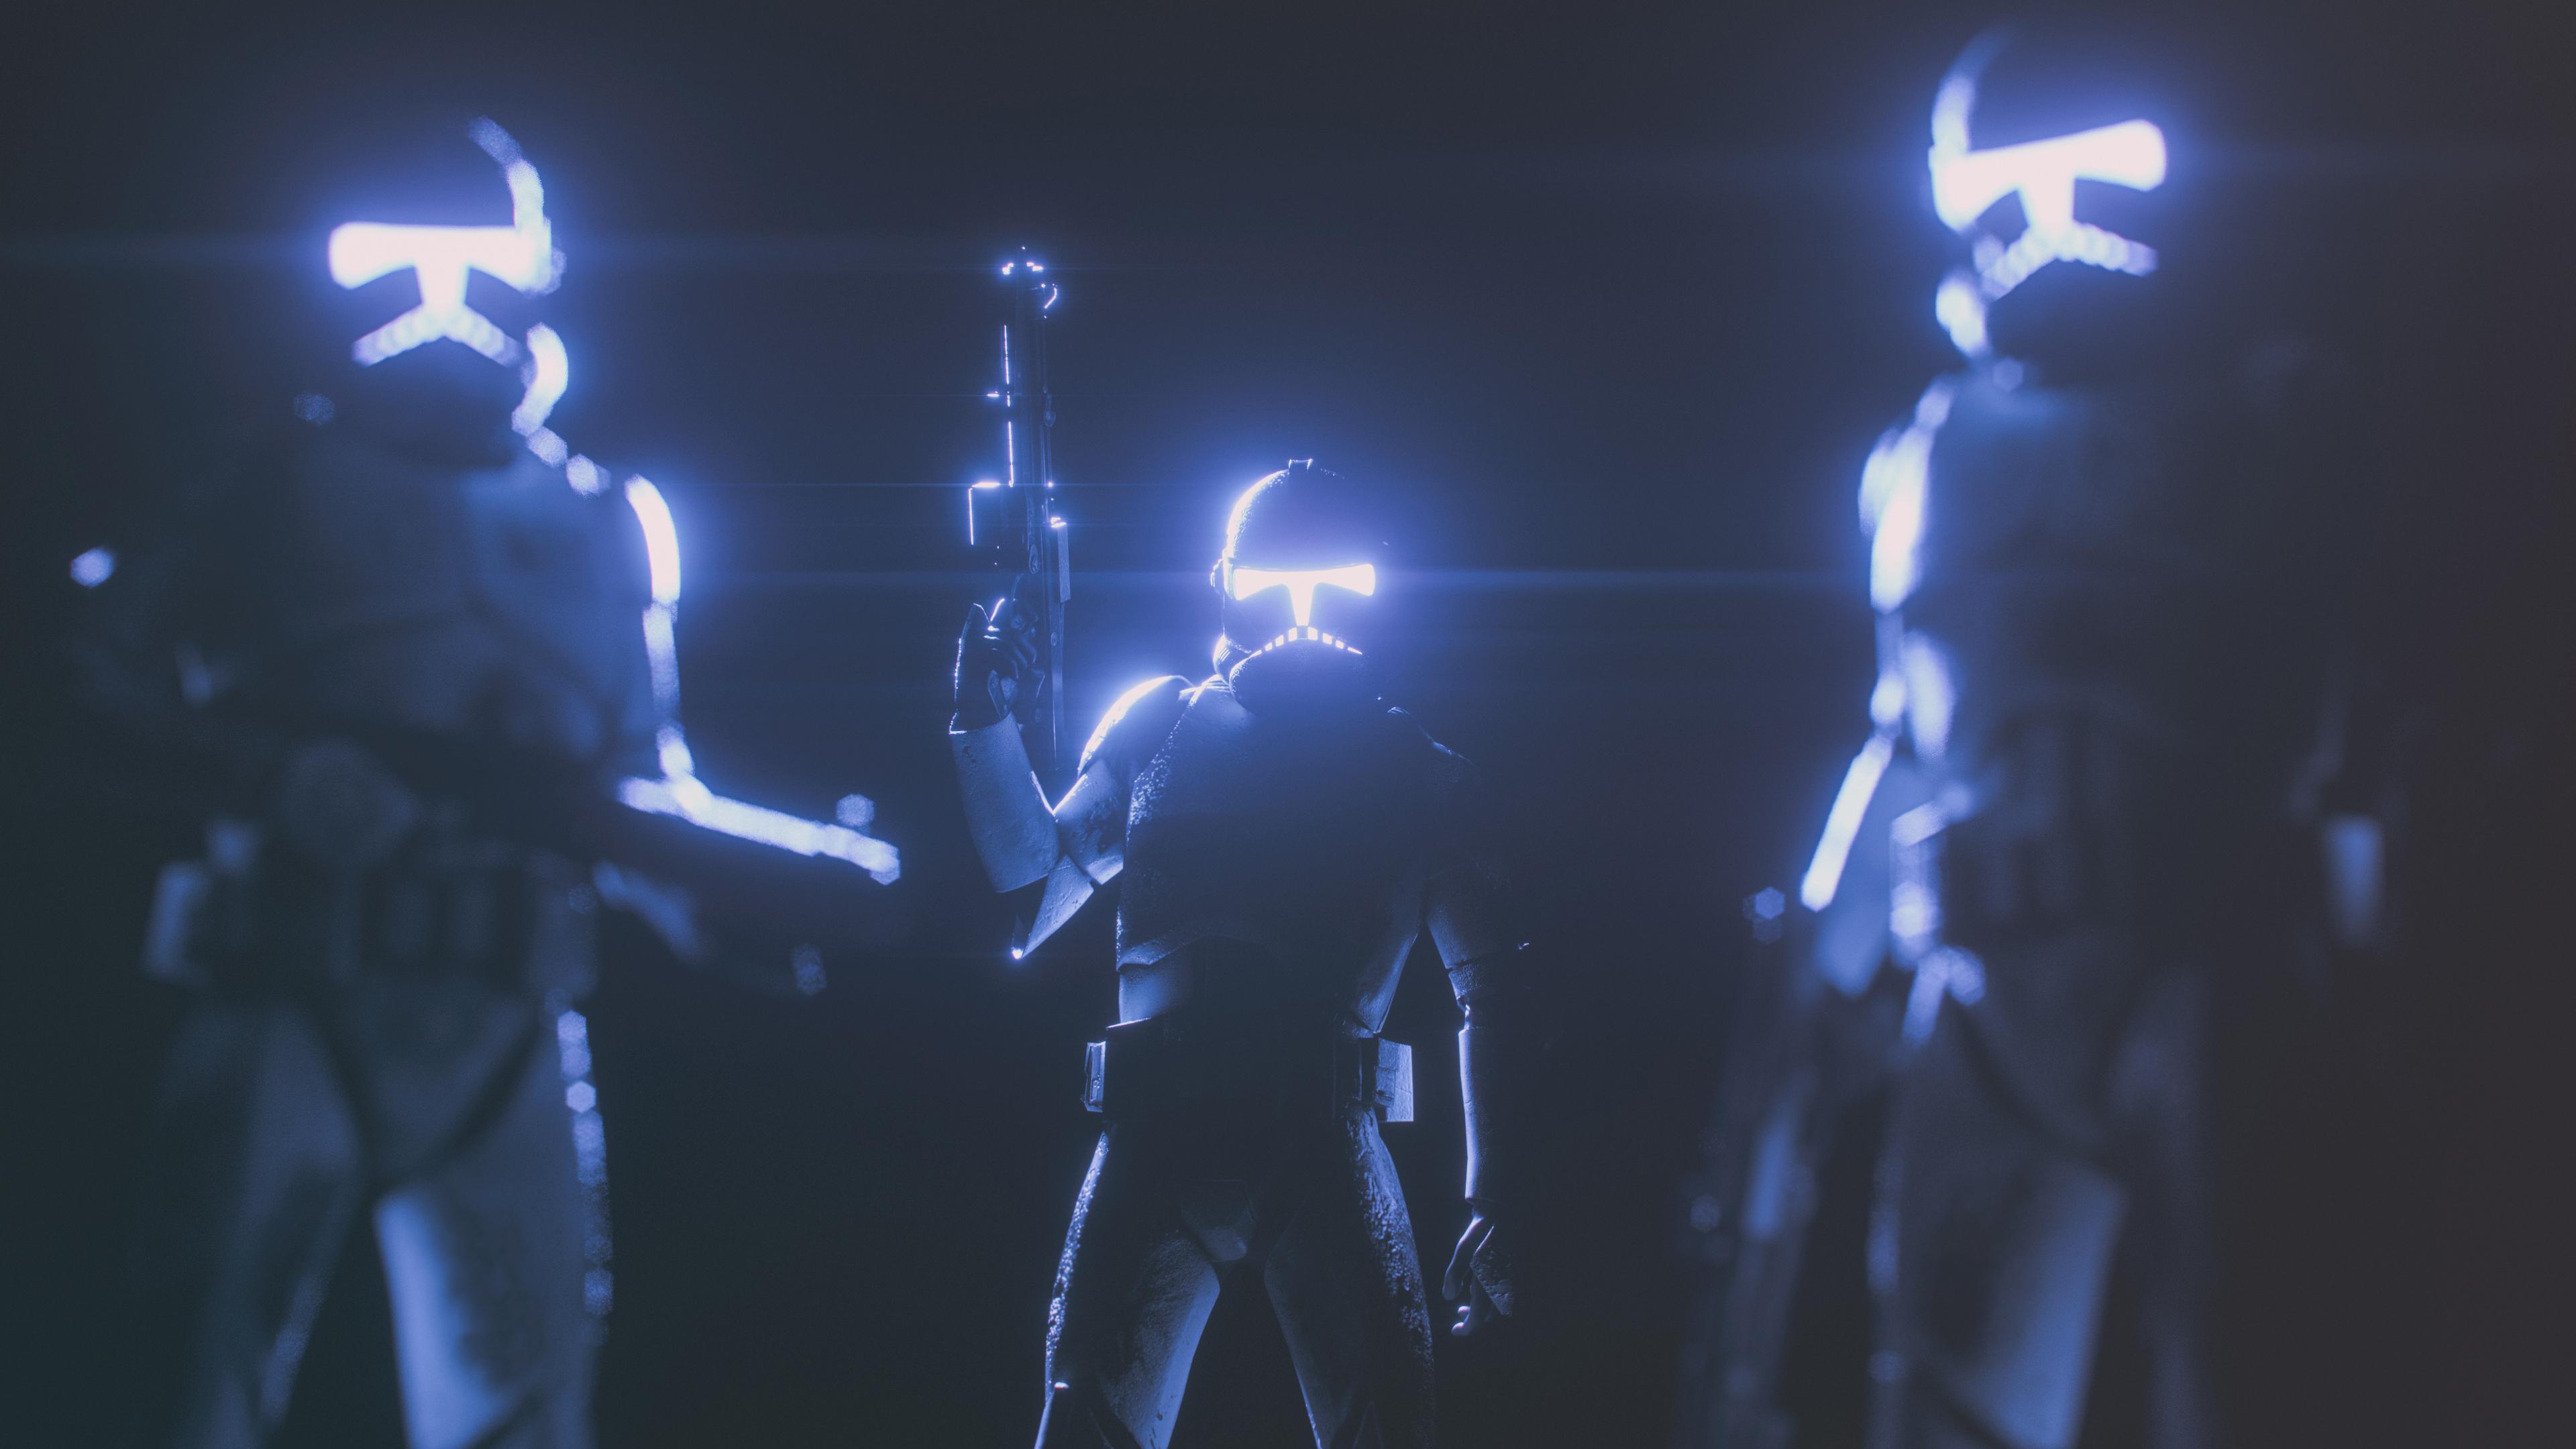 Clones Squad 4k Ultra Hd Wallpaper Background Image 3840x2160 Id 928185 Wallpaper Abyss